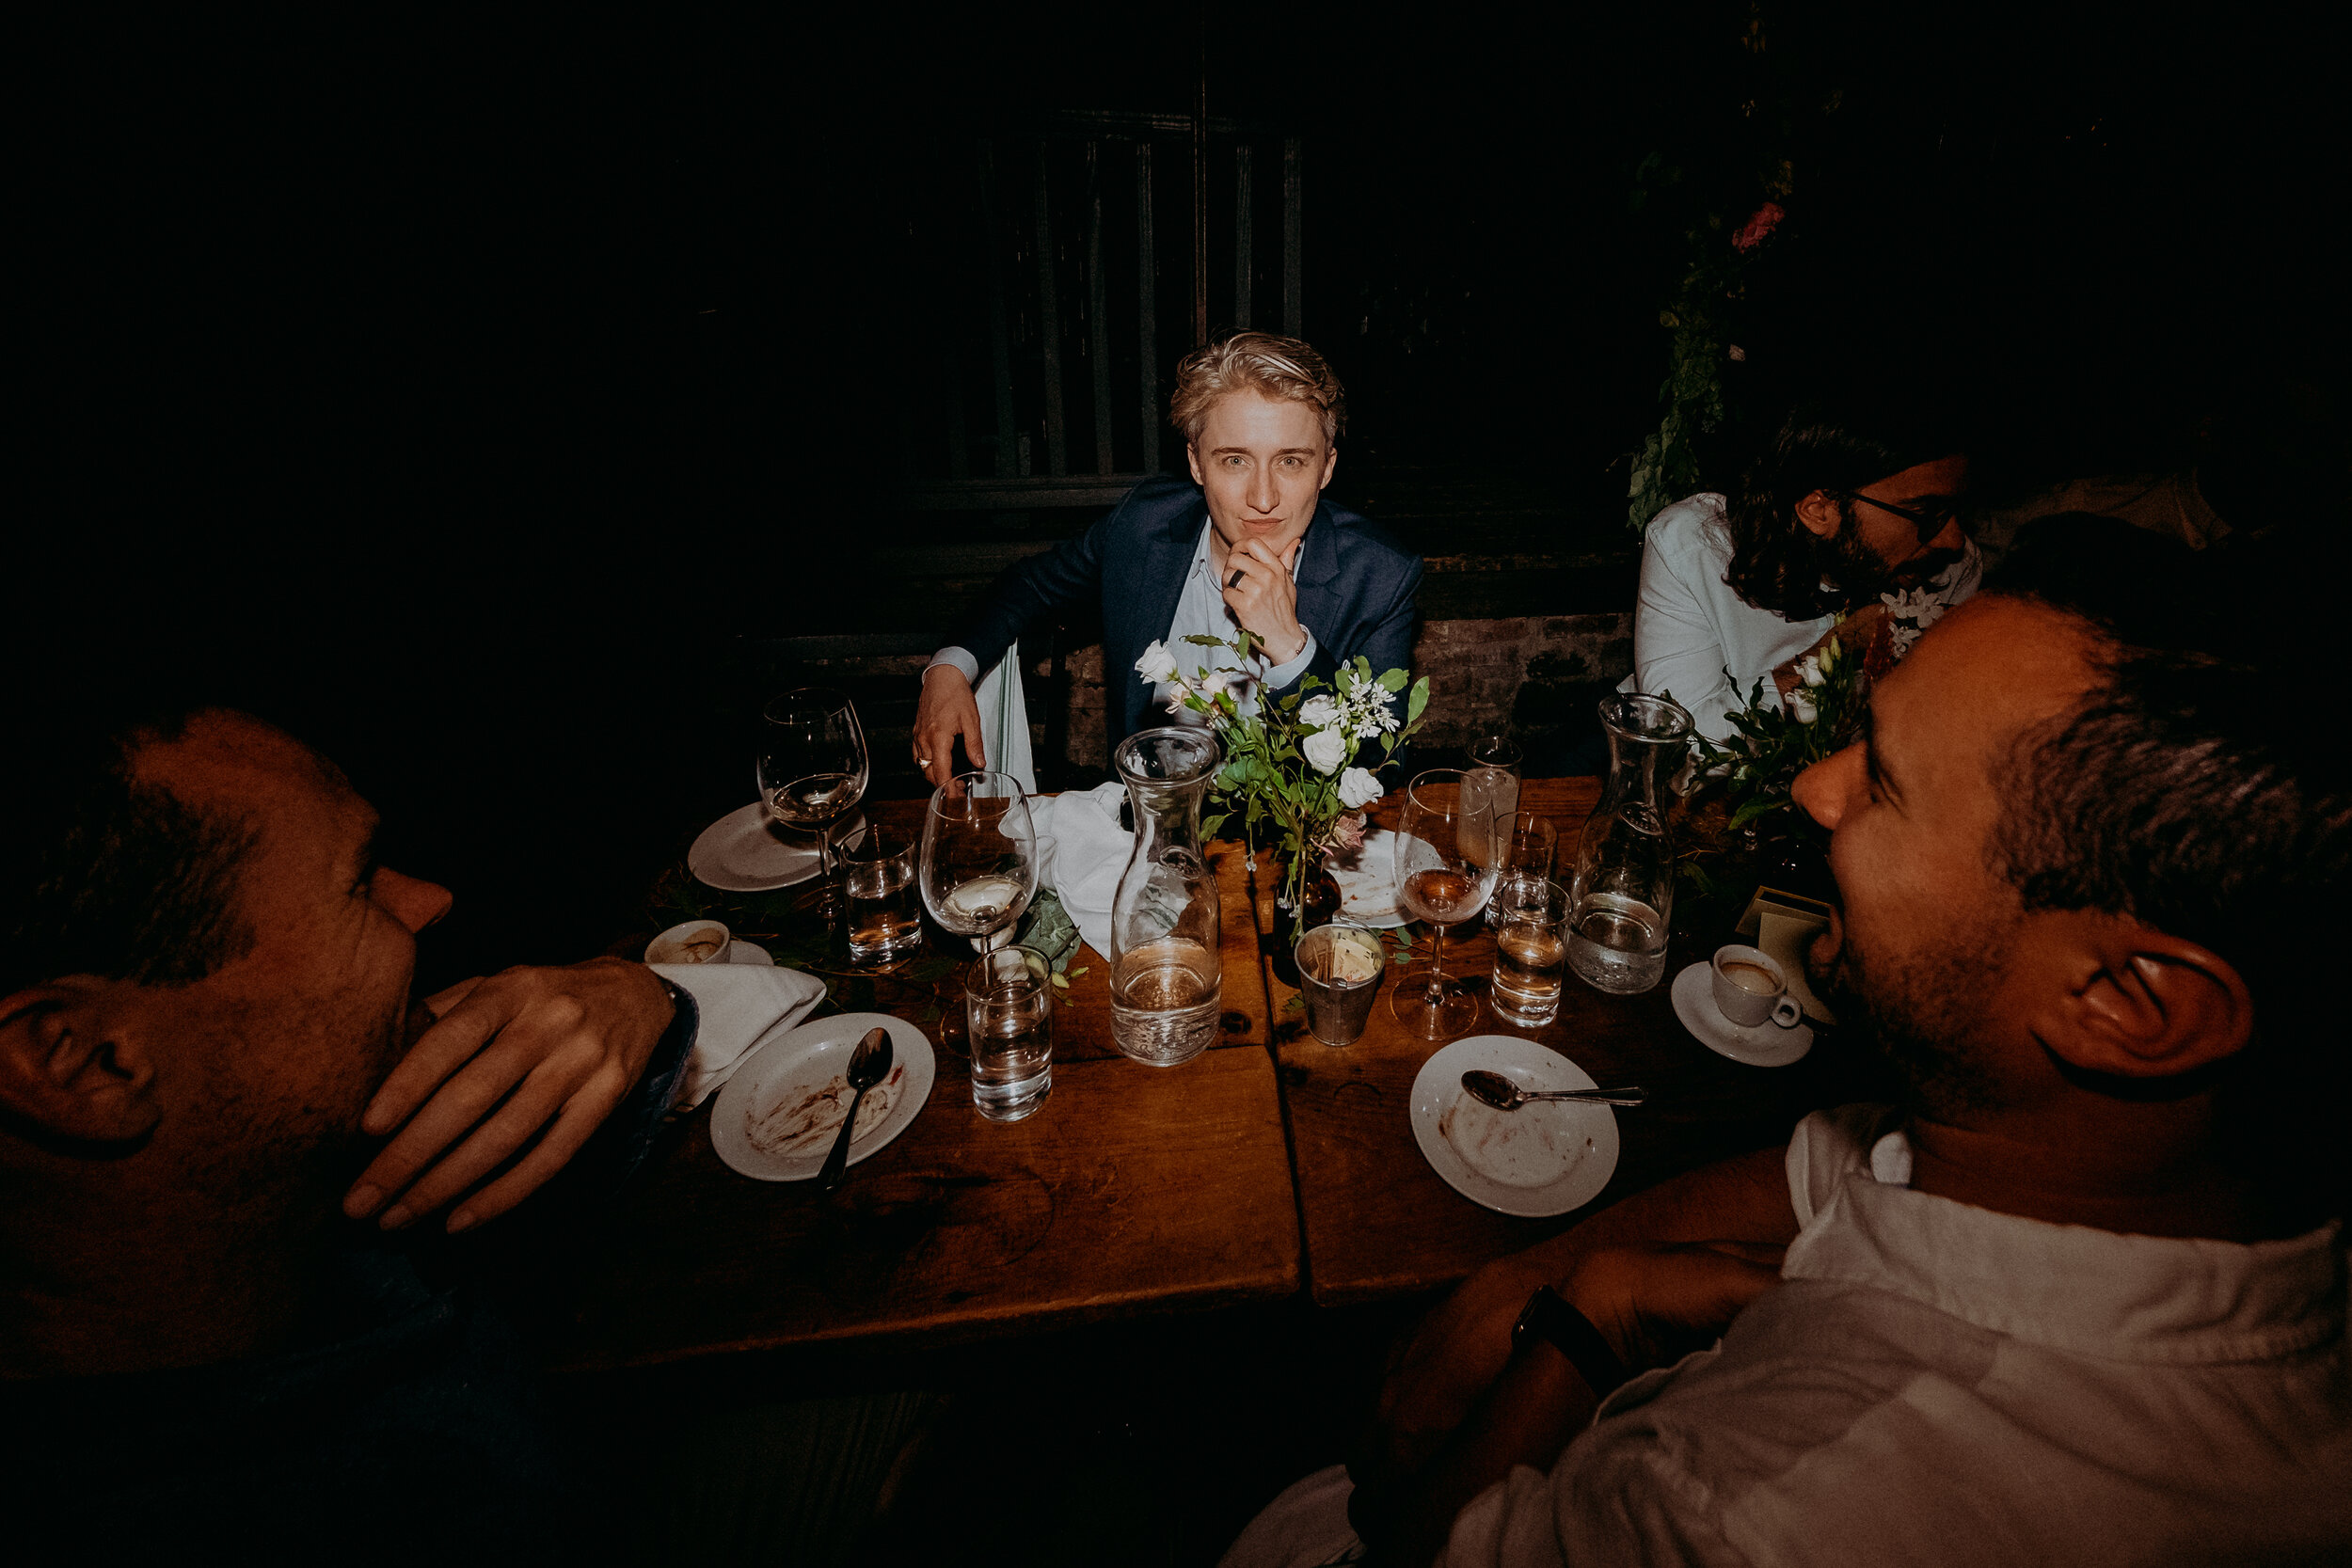 Aurora_Brooklyn_Wedding_Photographer_Chellise_Michael_Photography-551.jpg